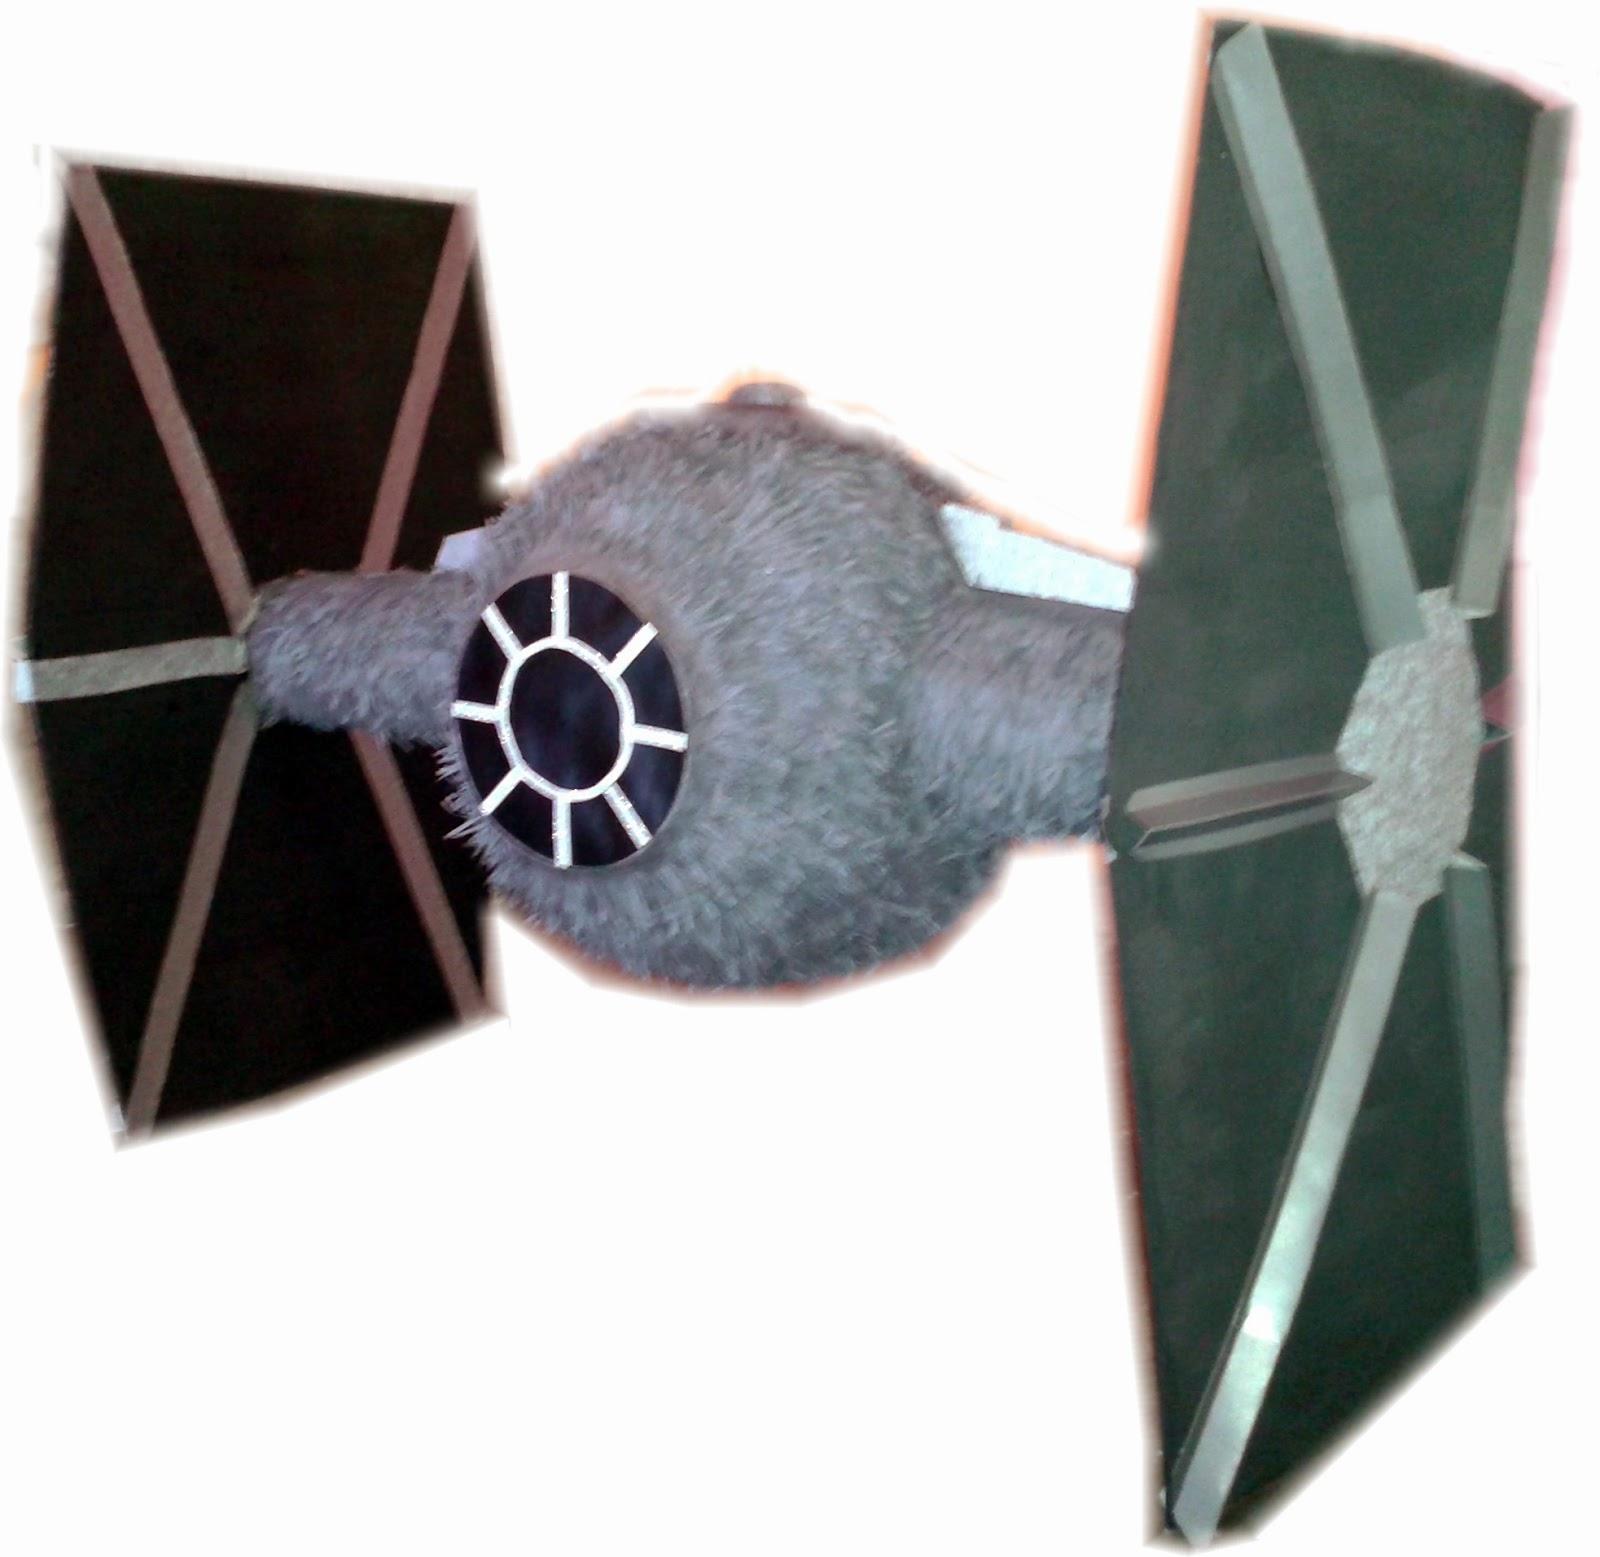 #7E584D Star Magazine Rachael Edwards 5515 decorations de noel star wars 1600x1557 px @ aertt.com